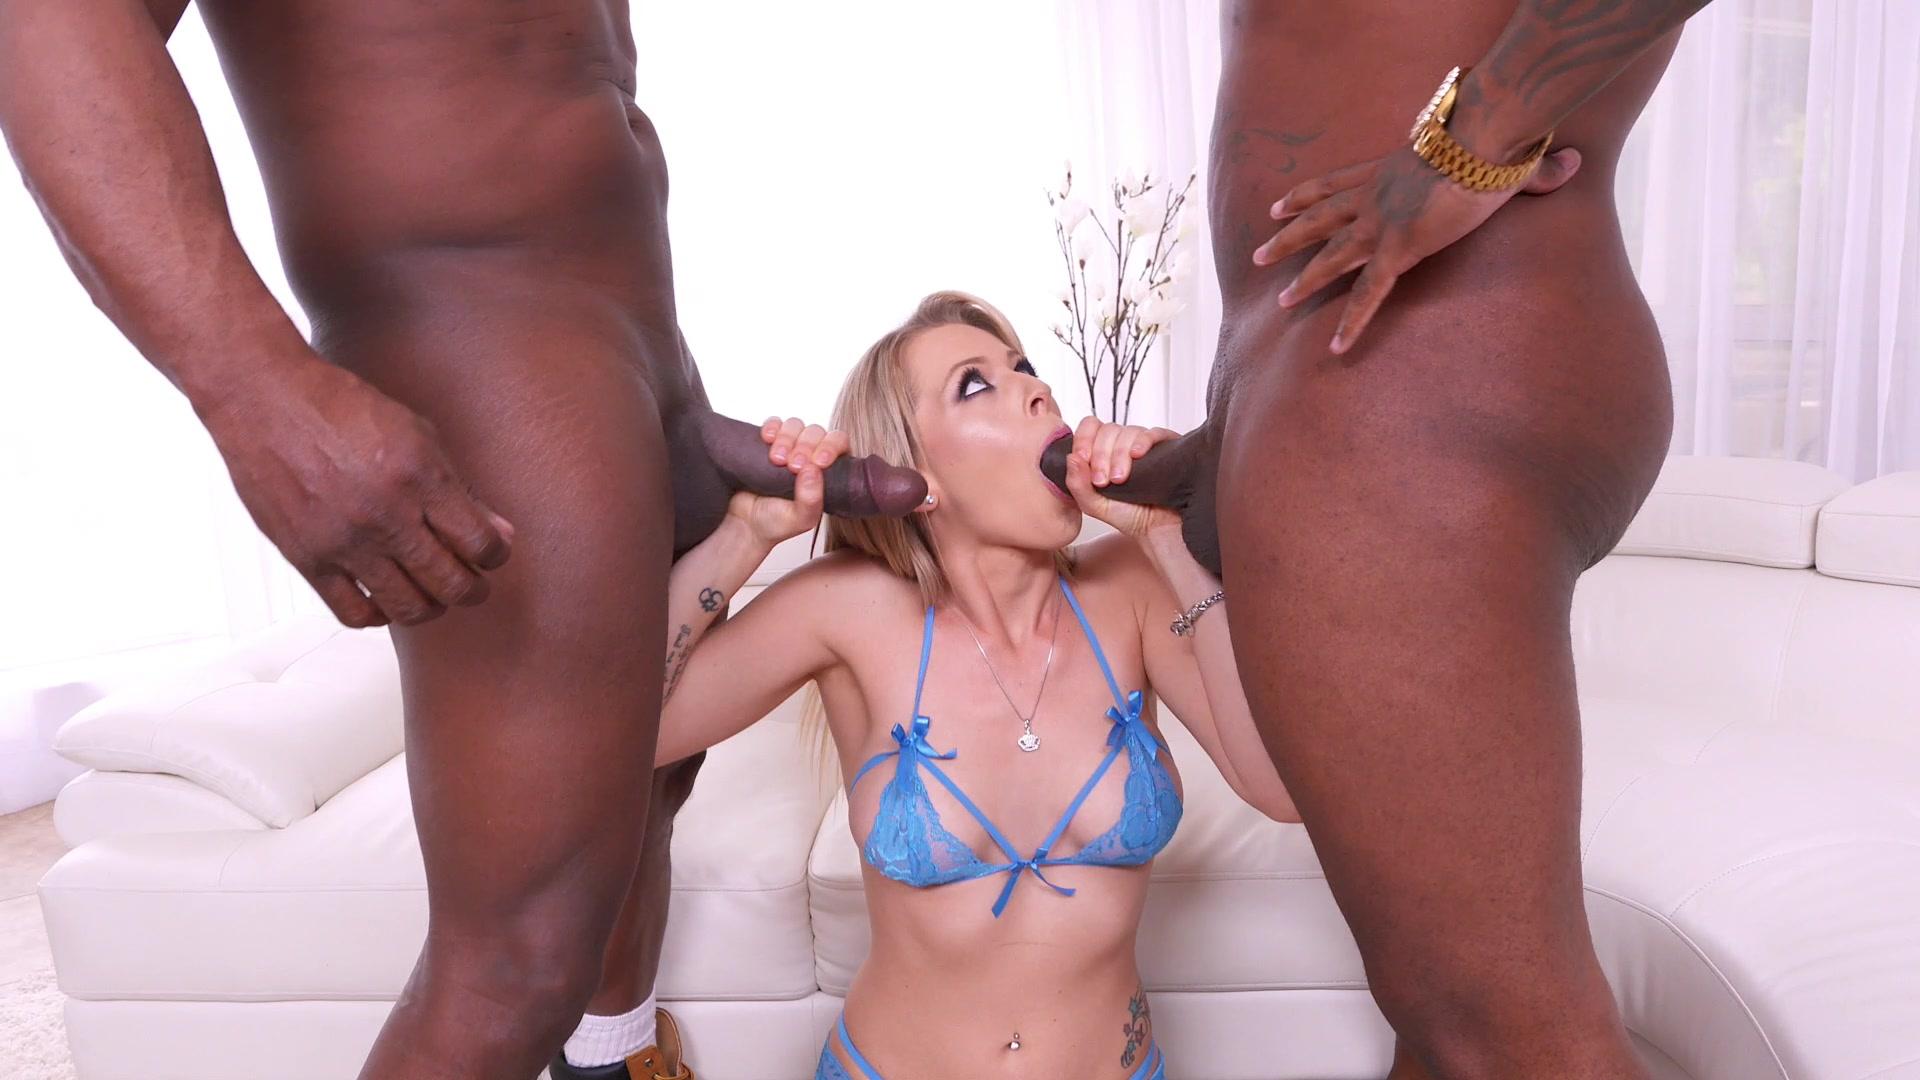 Straight interracial twink sex